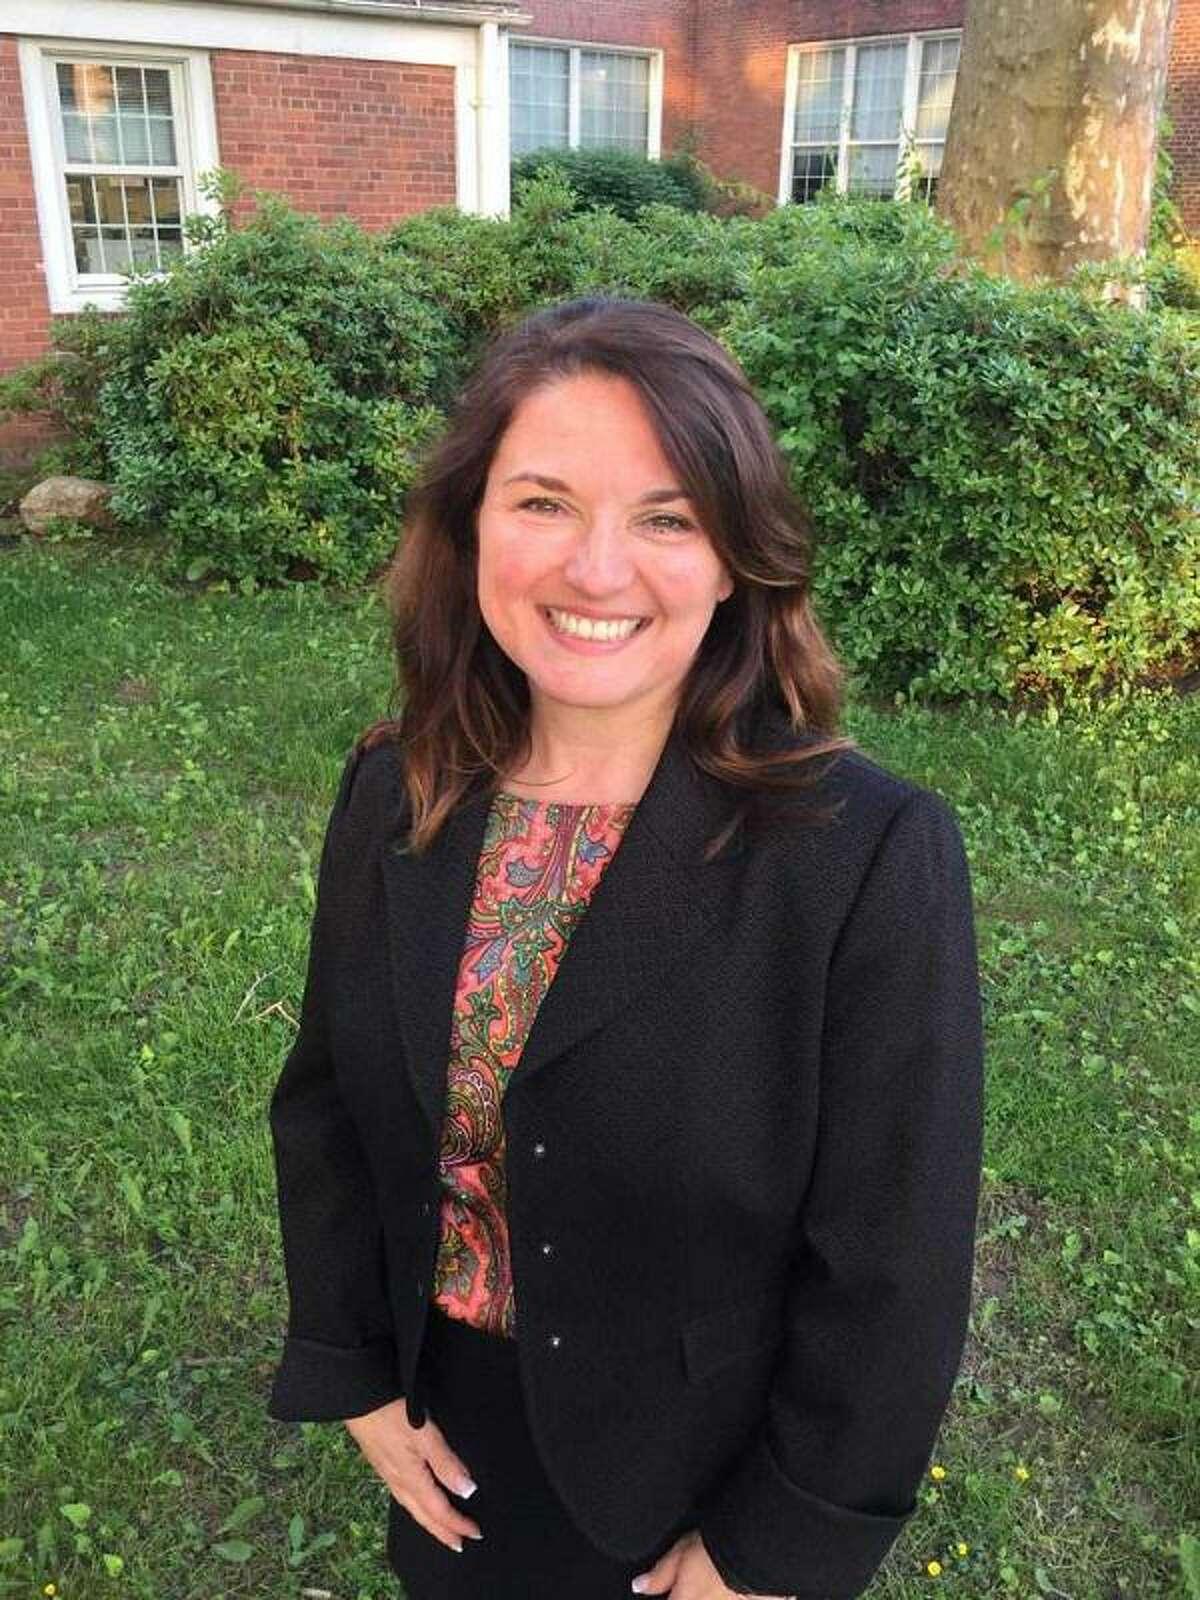 Milford Superintendent of Schools Anna Cutaia